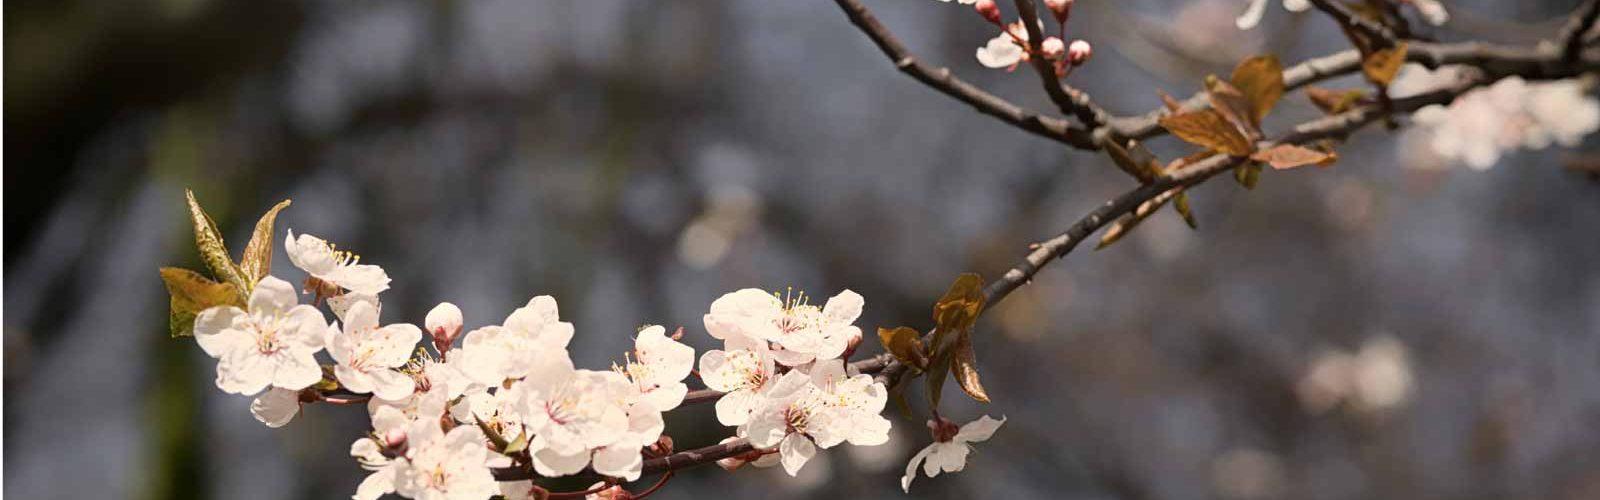 Branch of Cherry Blossom Tree